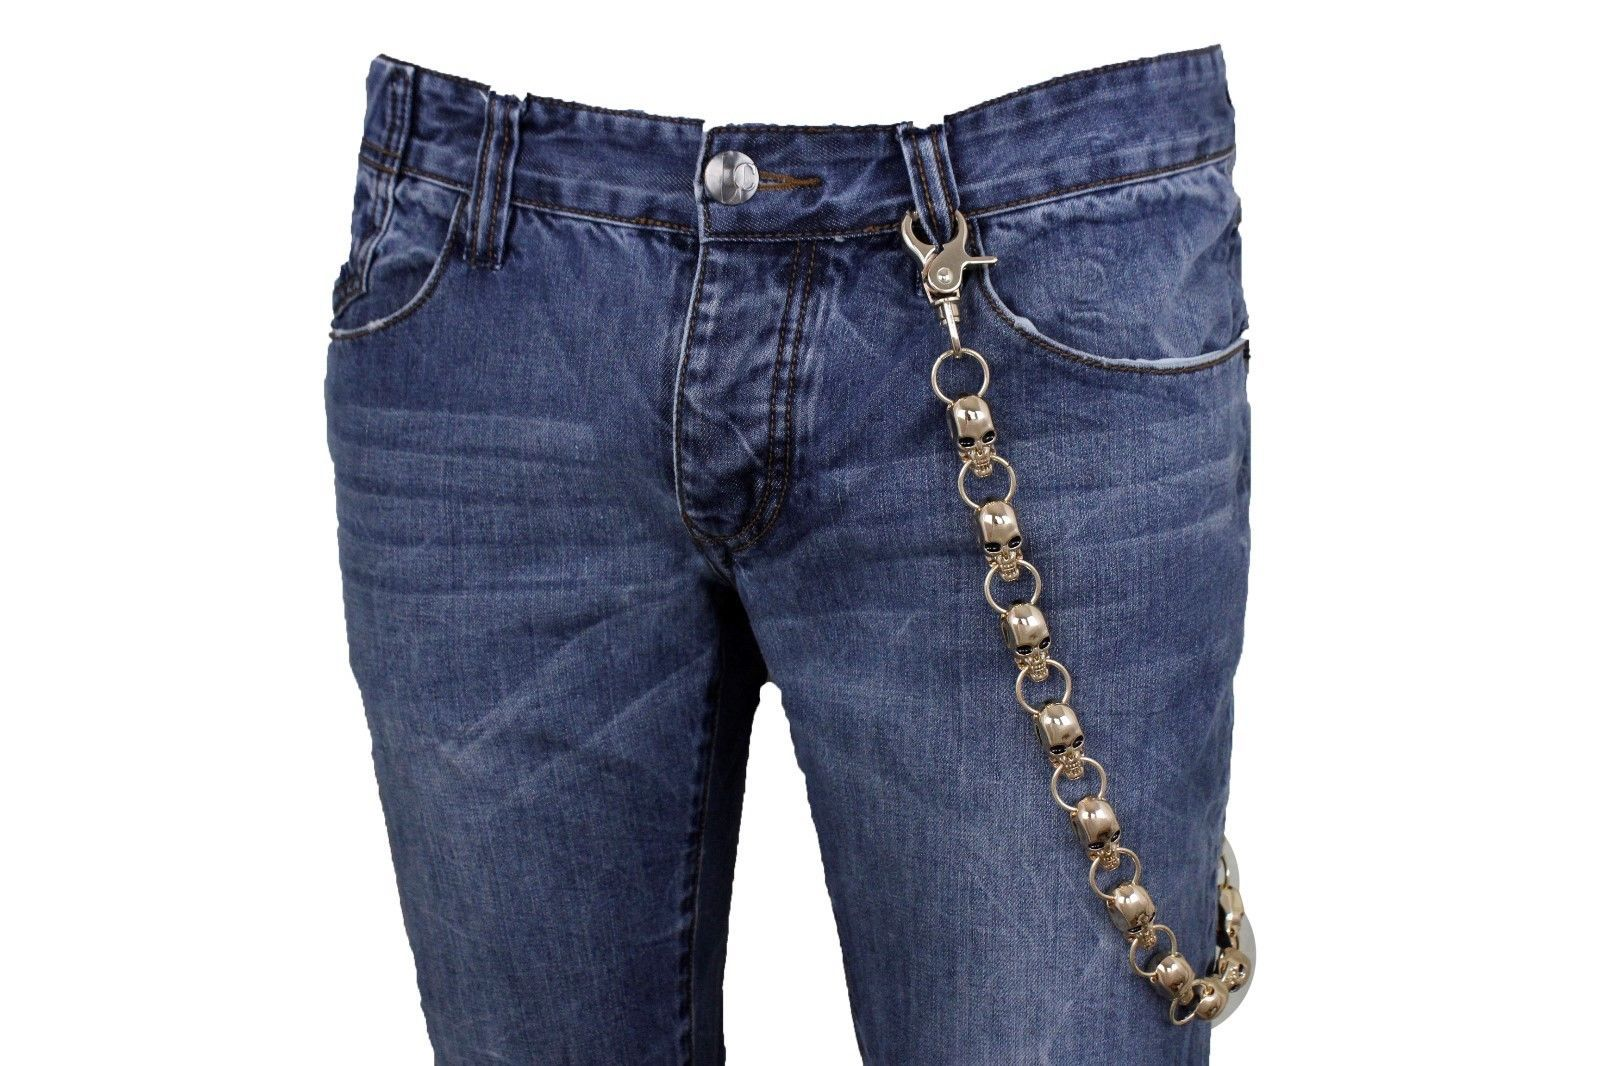 Men Black Metal Long Wallet Chains Pewter Skulls Biker Jeans Rock Trucker Strong